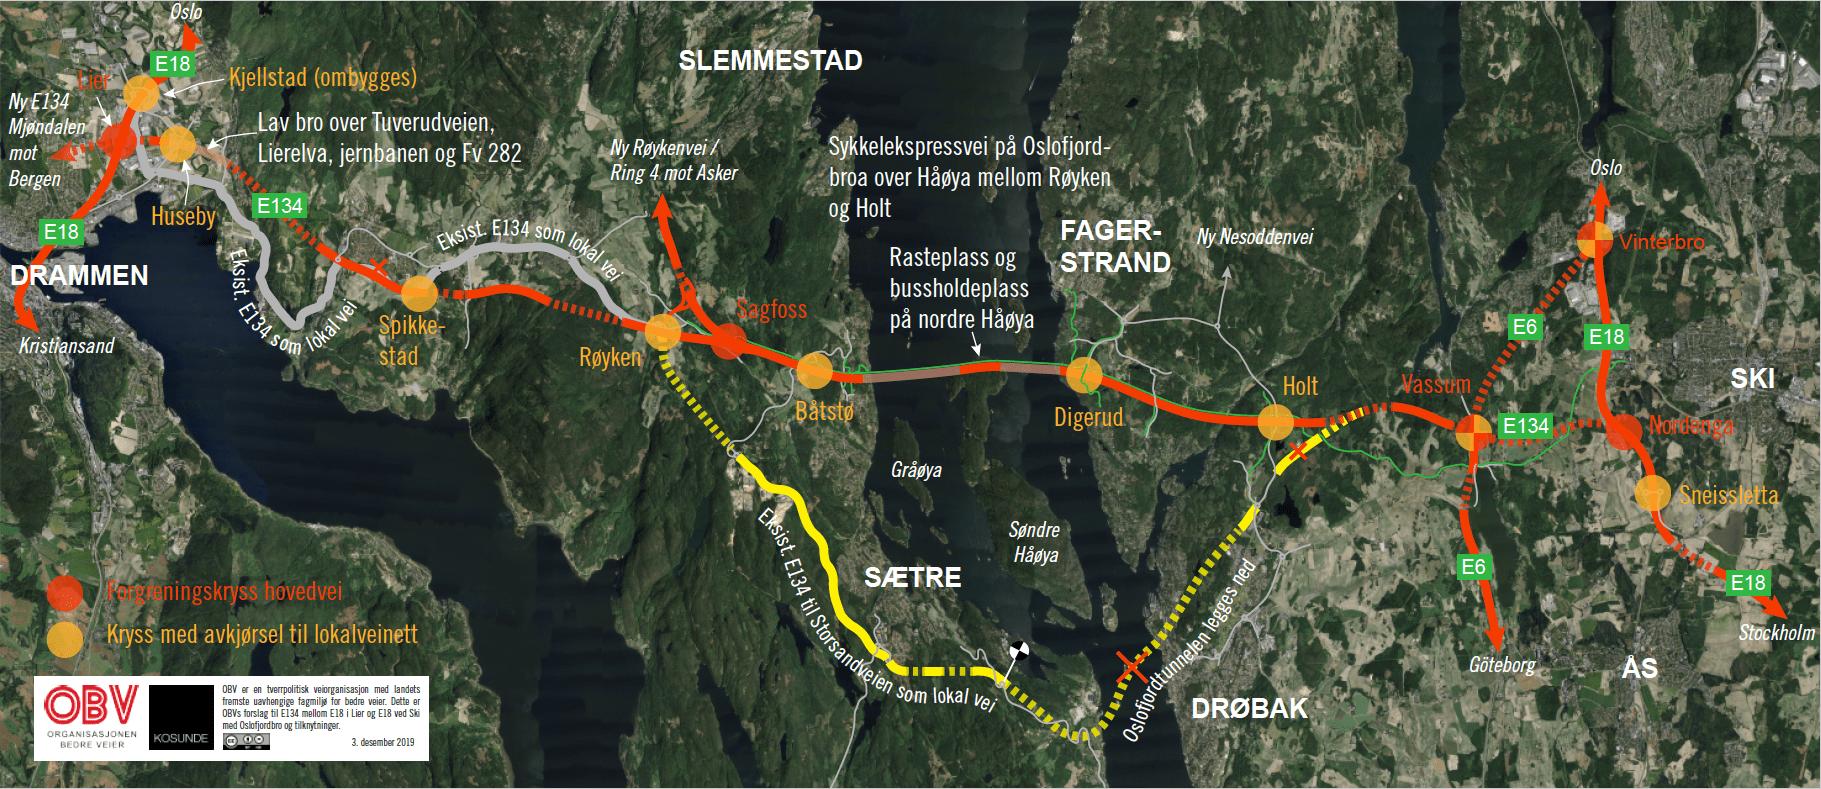 OBV Oslofjordbro. Illustrasjon: Knut Olaf Sunde